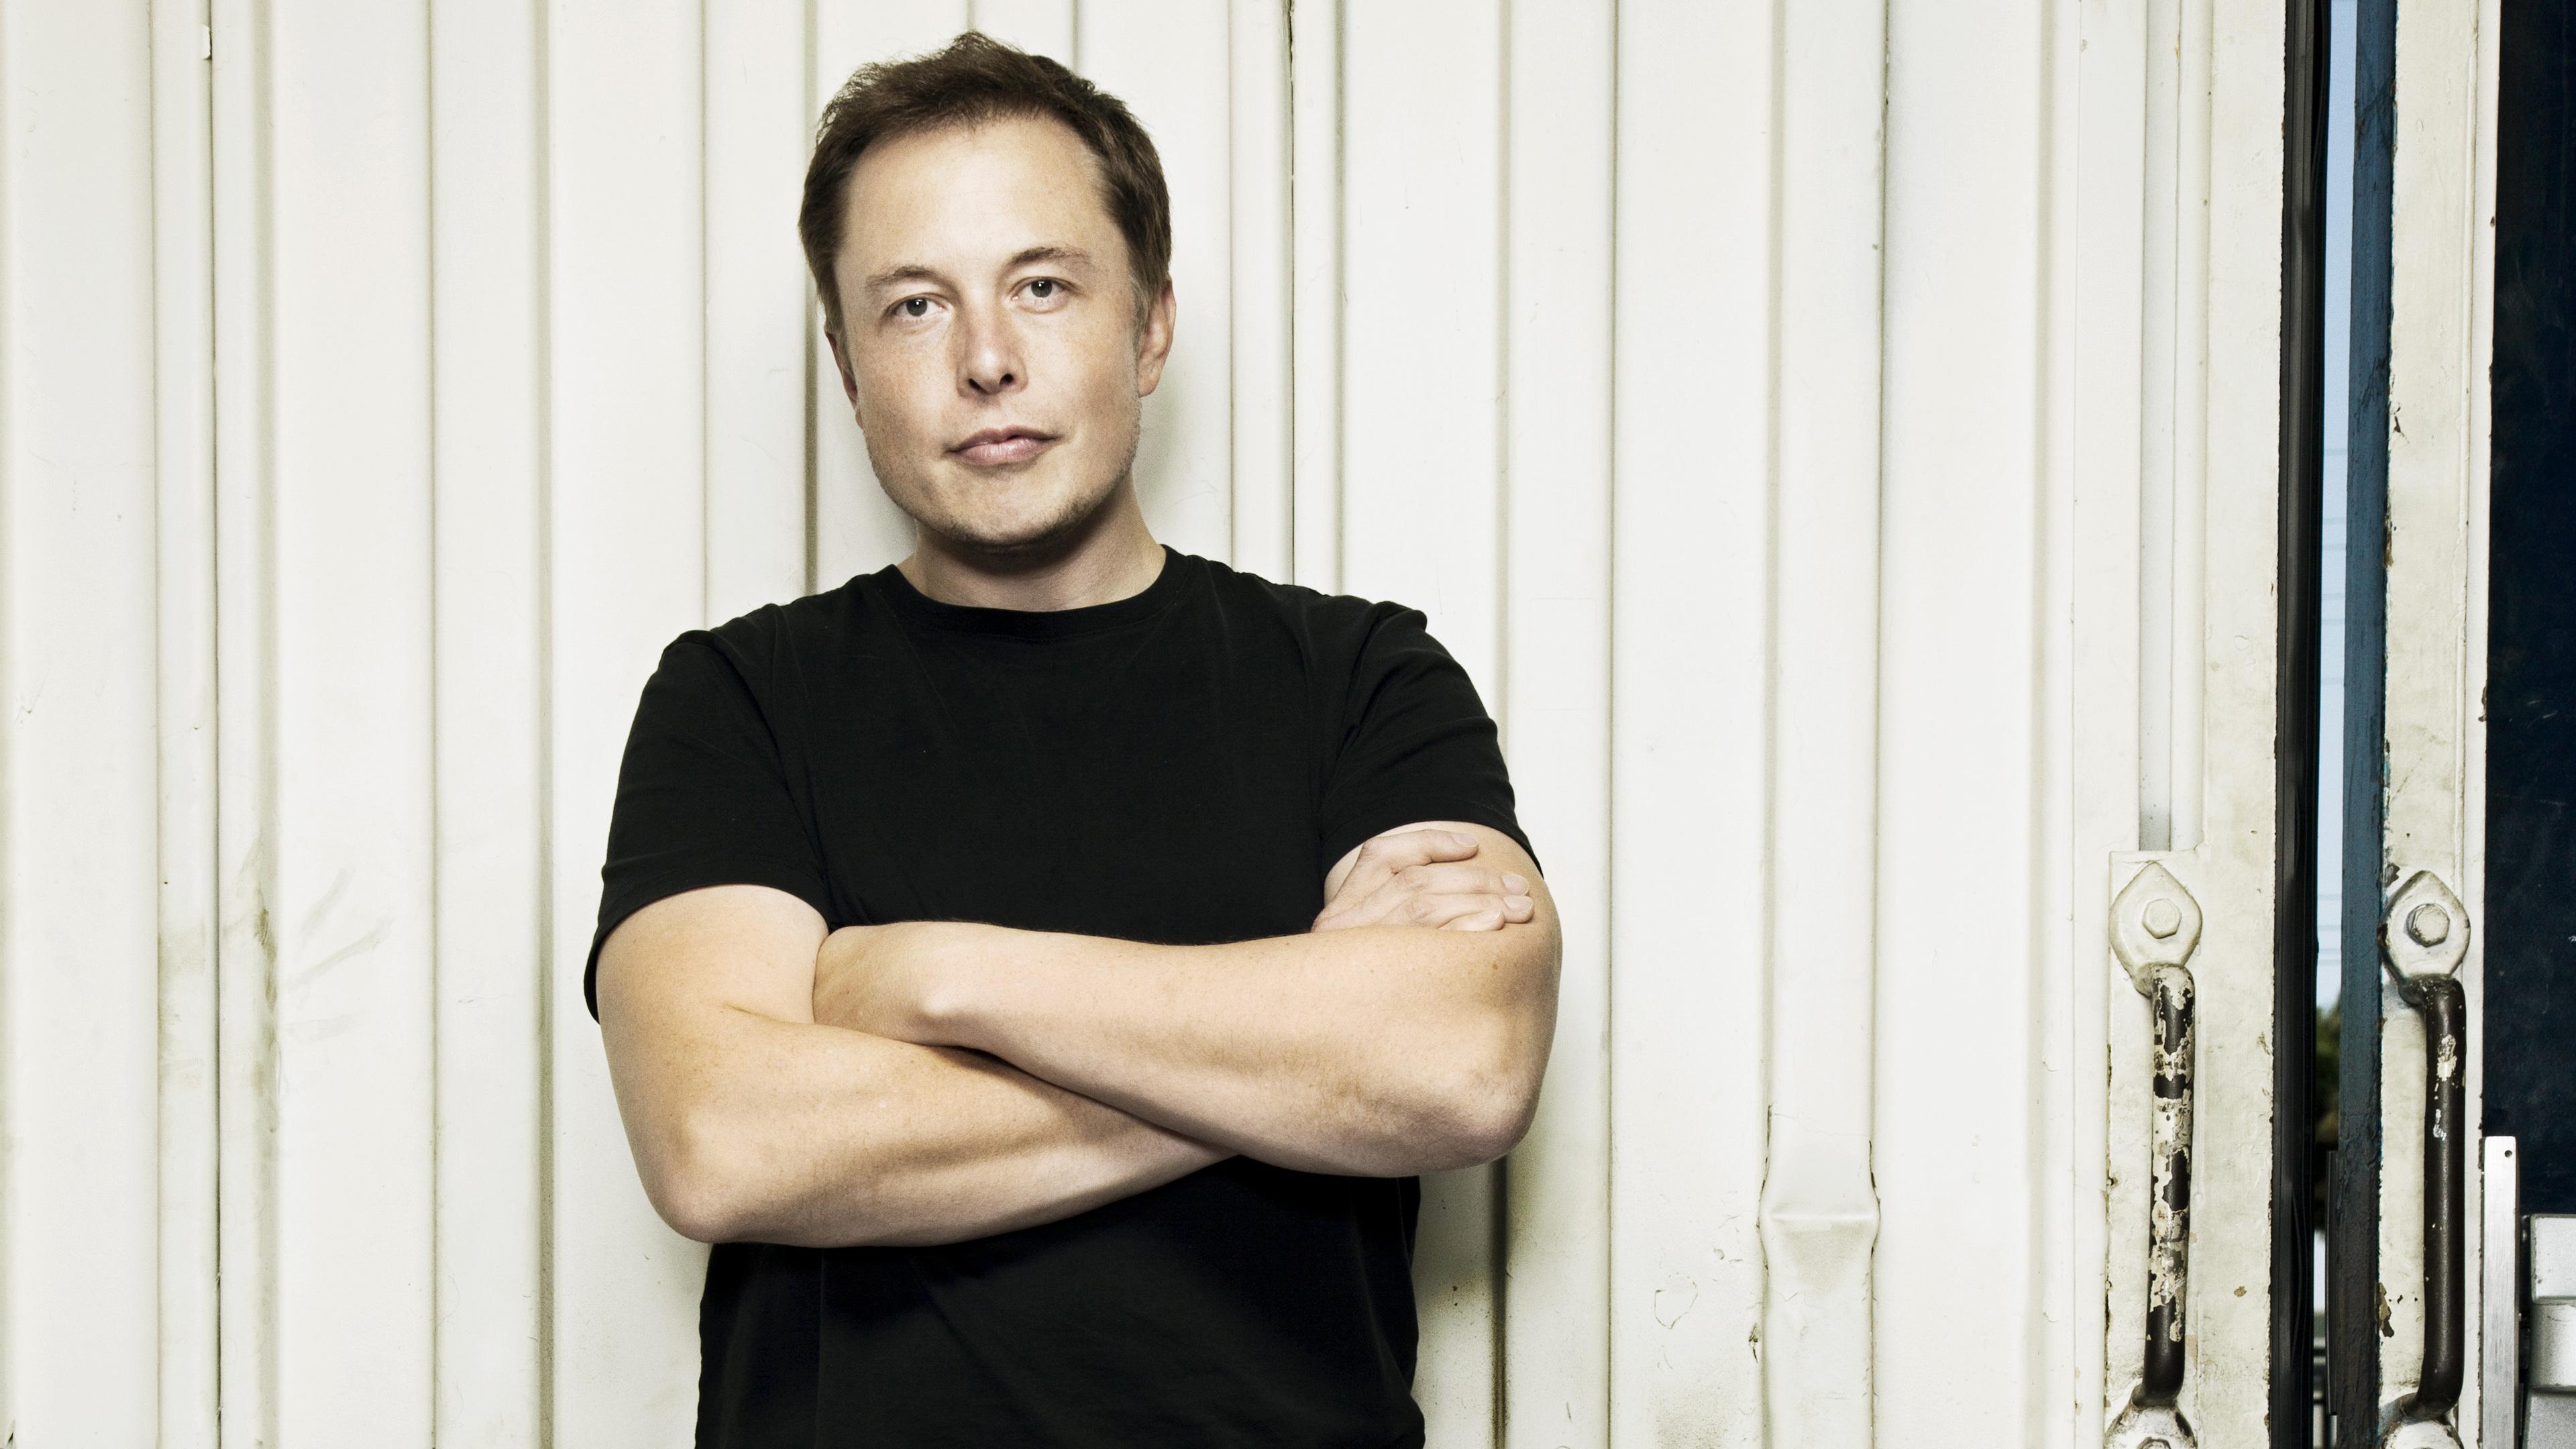 elon musk 1536946305 - Elon Musk - male celebrities wallpapers, hd-wallpapers, elon musk wallpapers, boys wallpapers, 4k-wallpapers